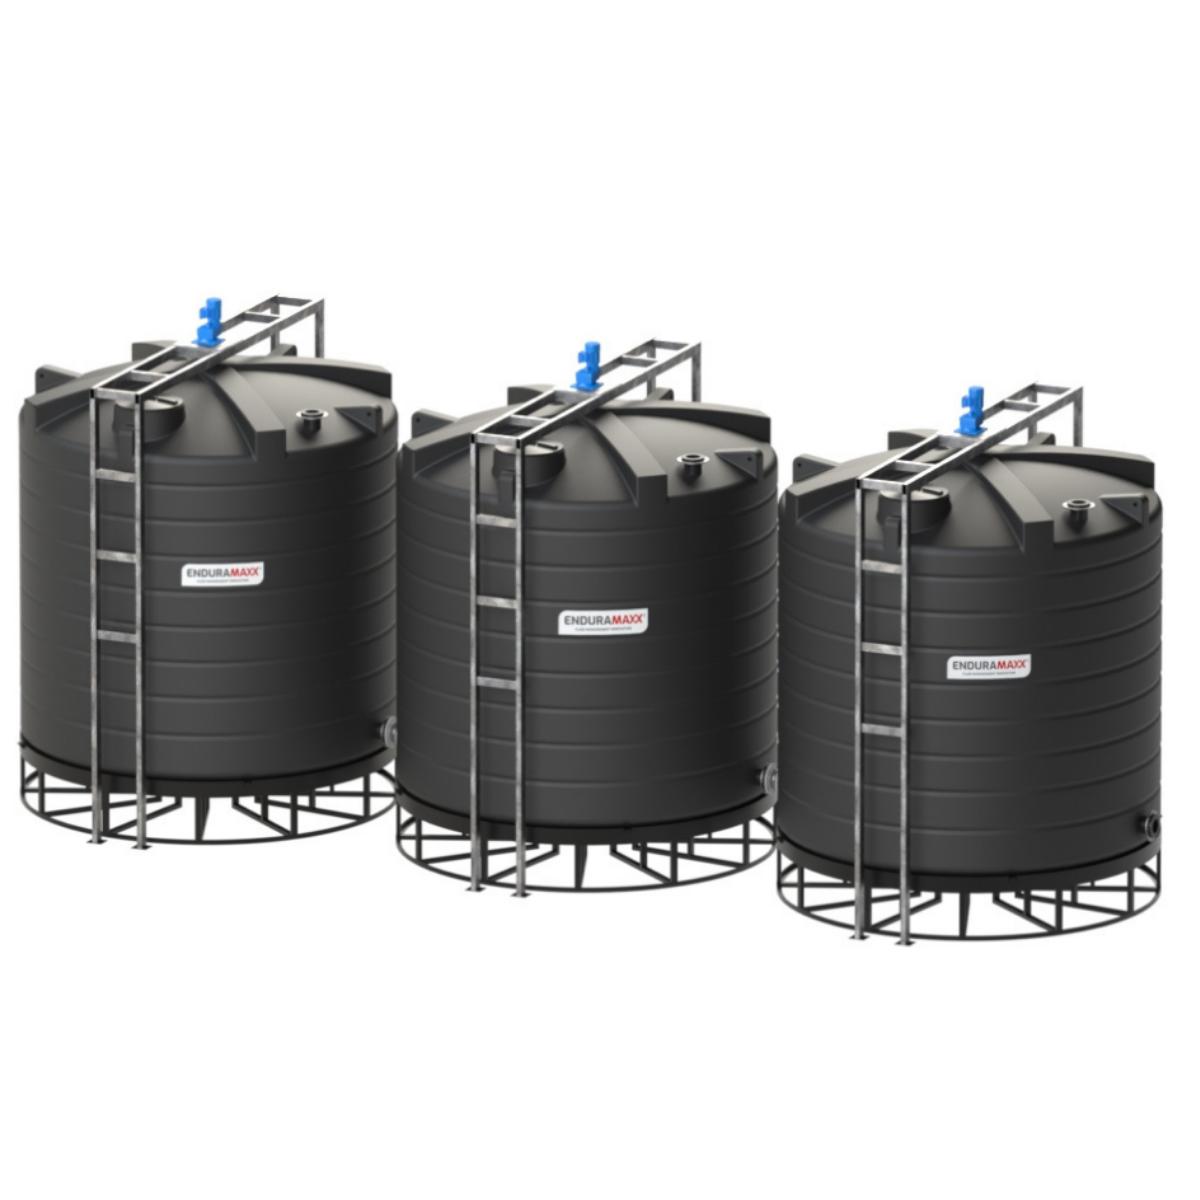 Enduramaxx Sludge Buffer Tanks